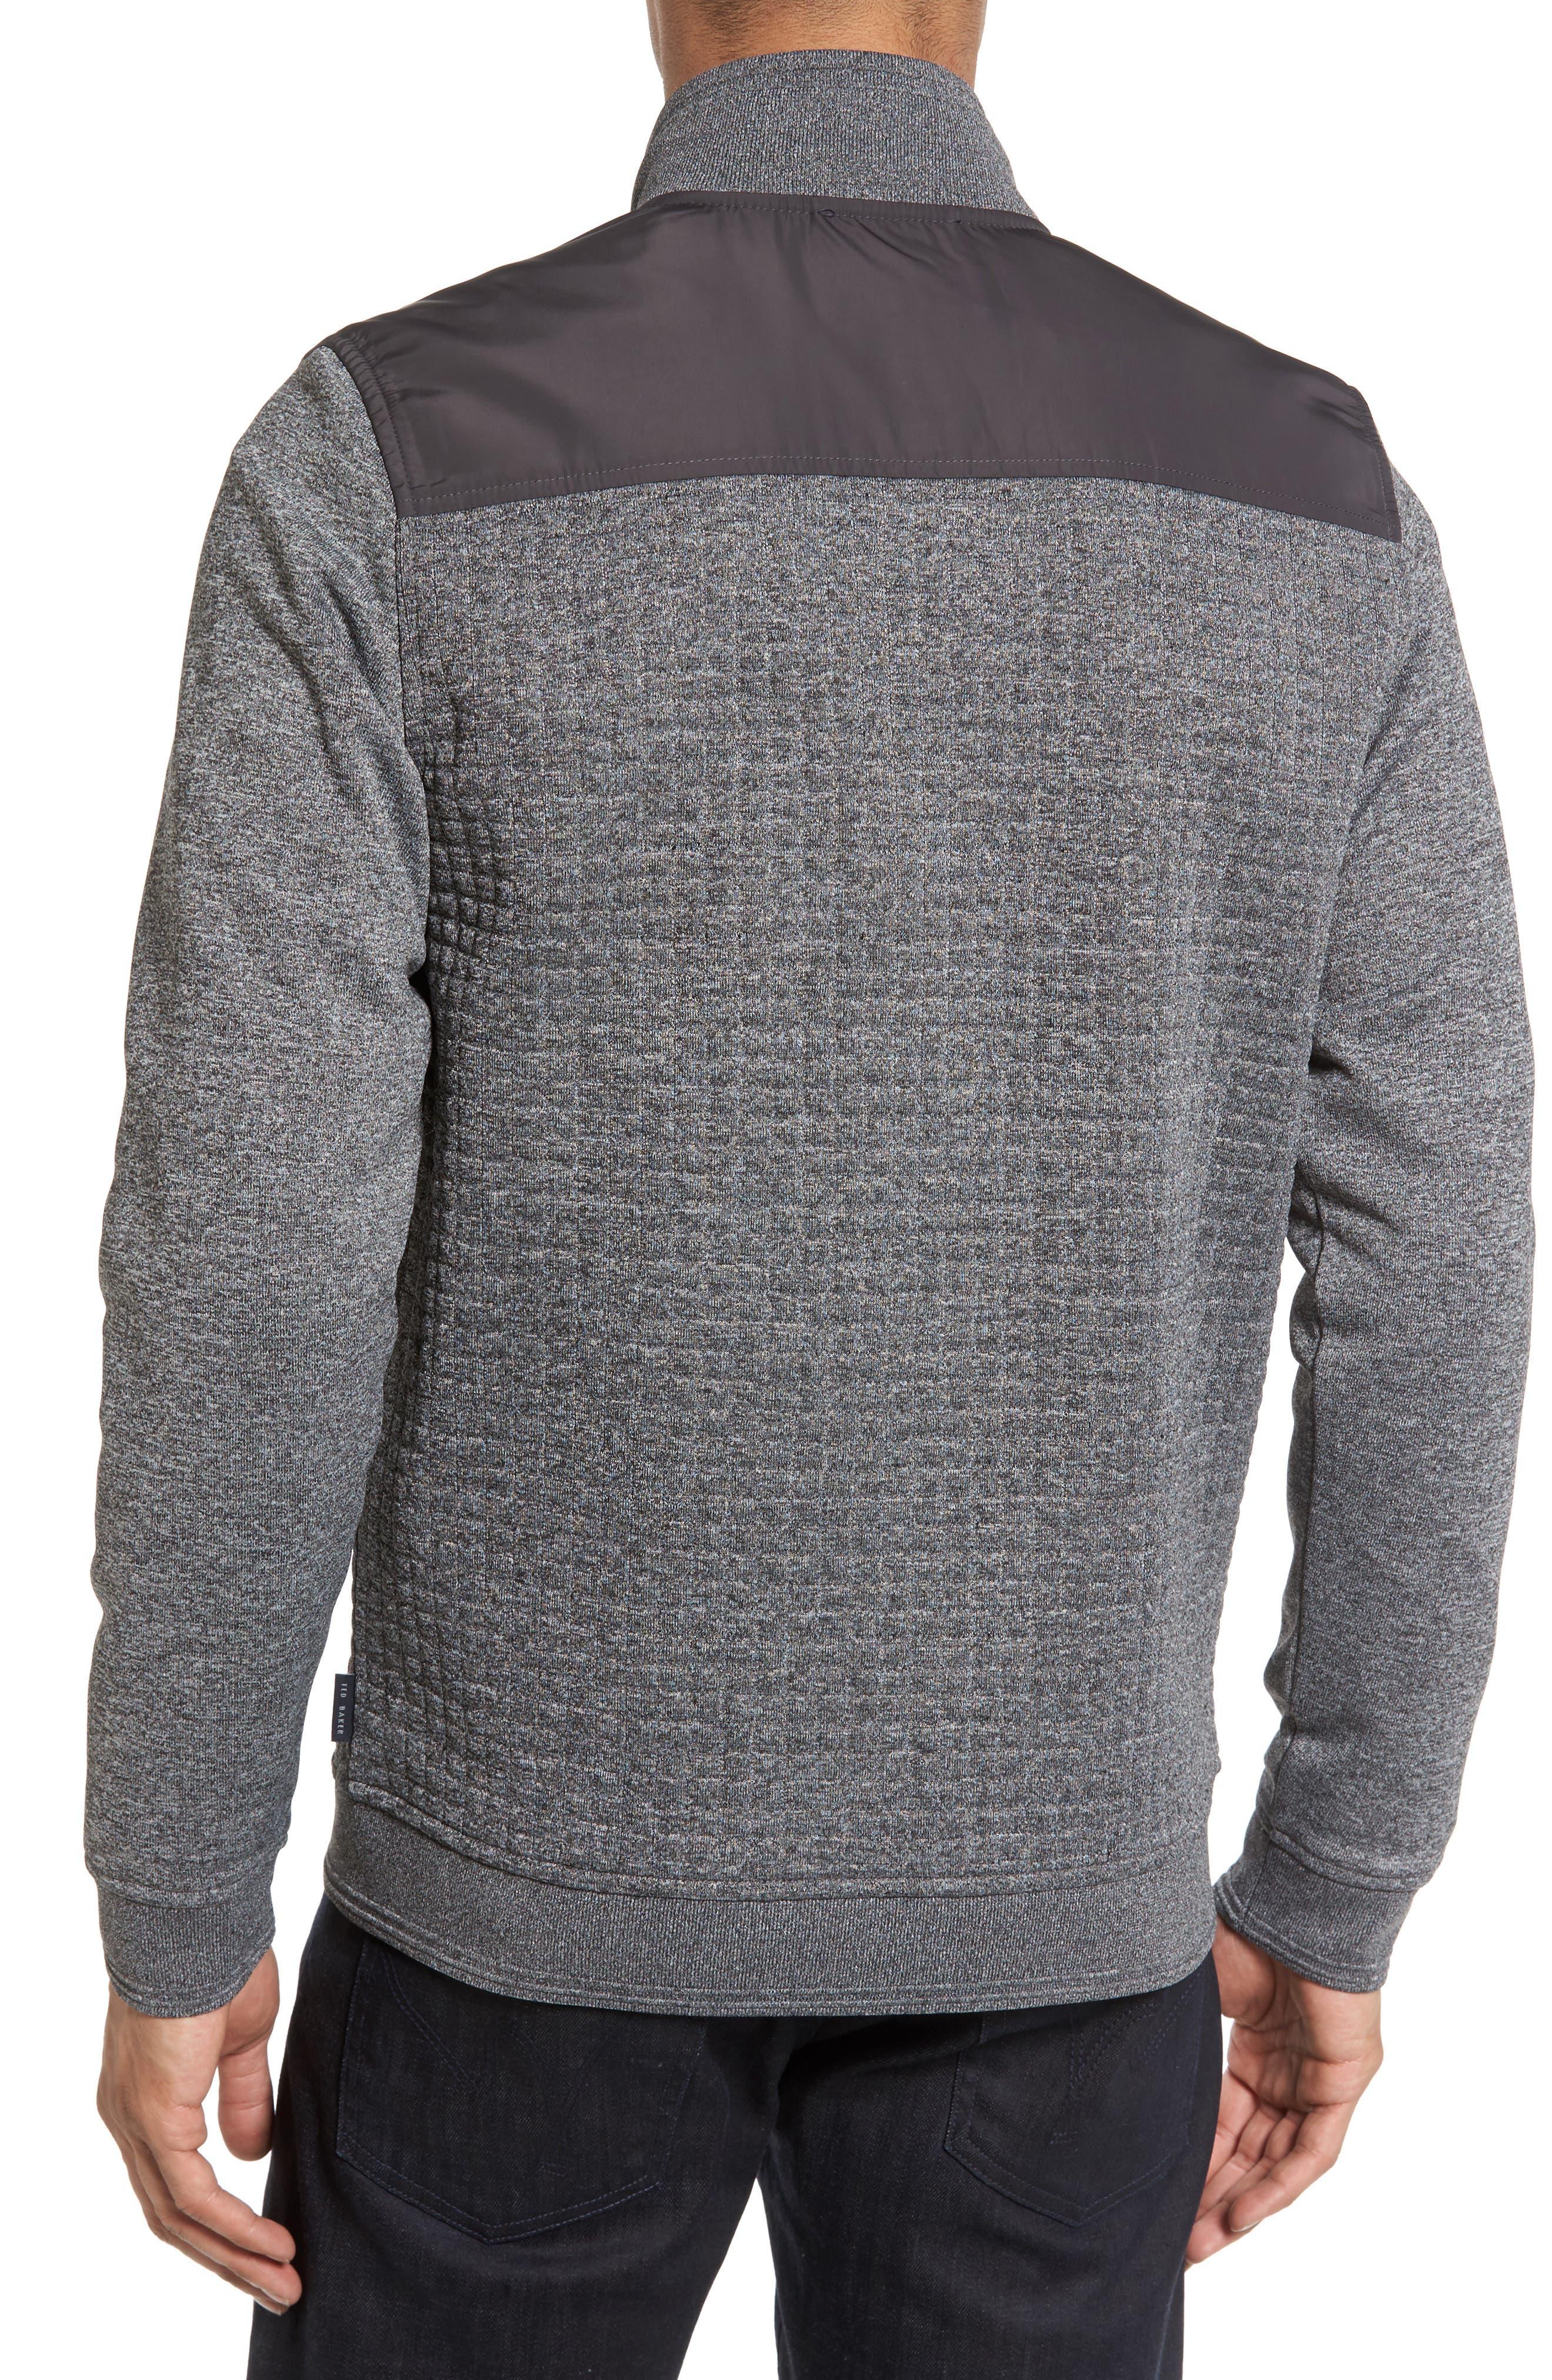 Whooty Full Zip Fleece Jacket,                             Alternate thumbnail 2, color,                             Charcoal